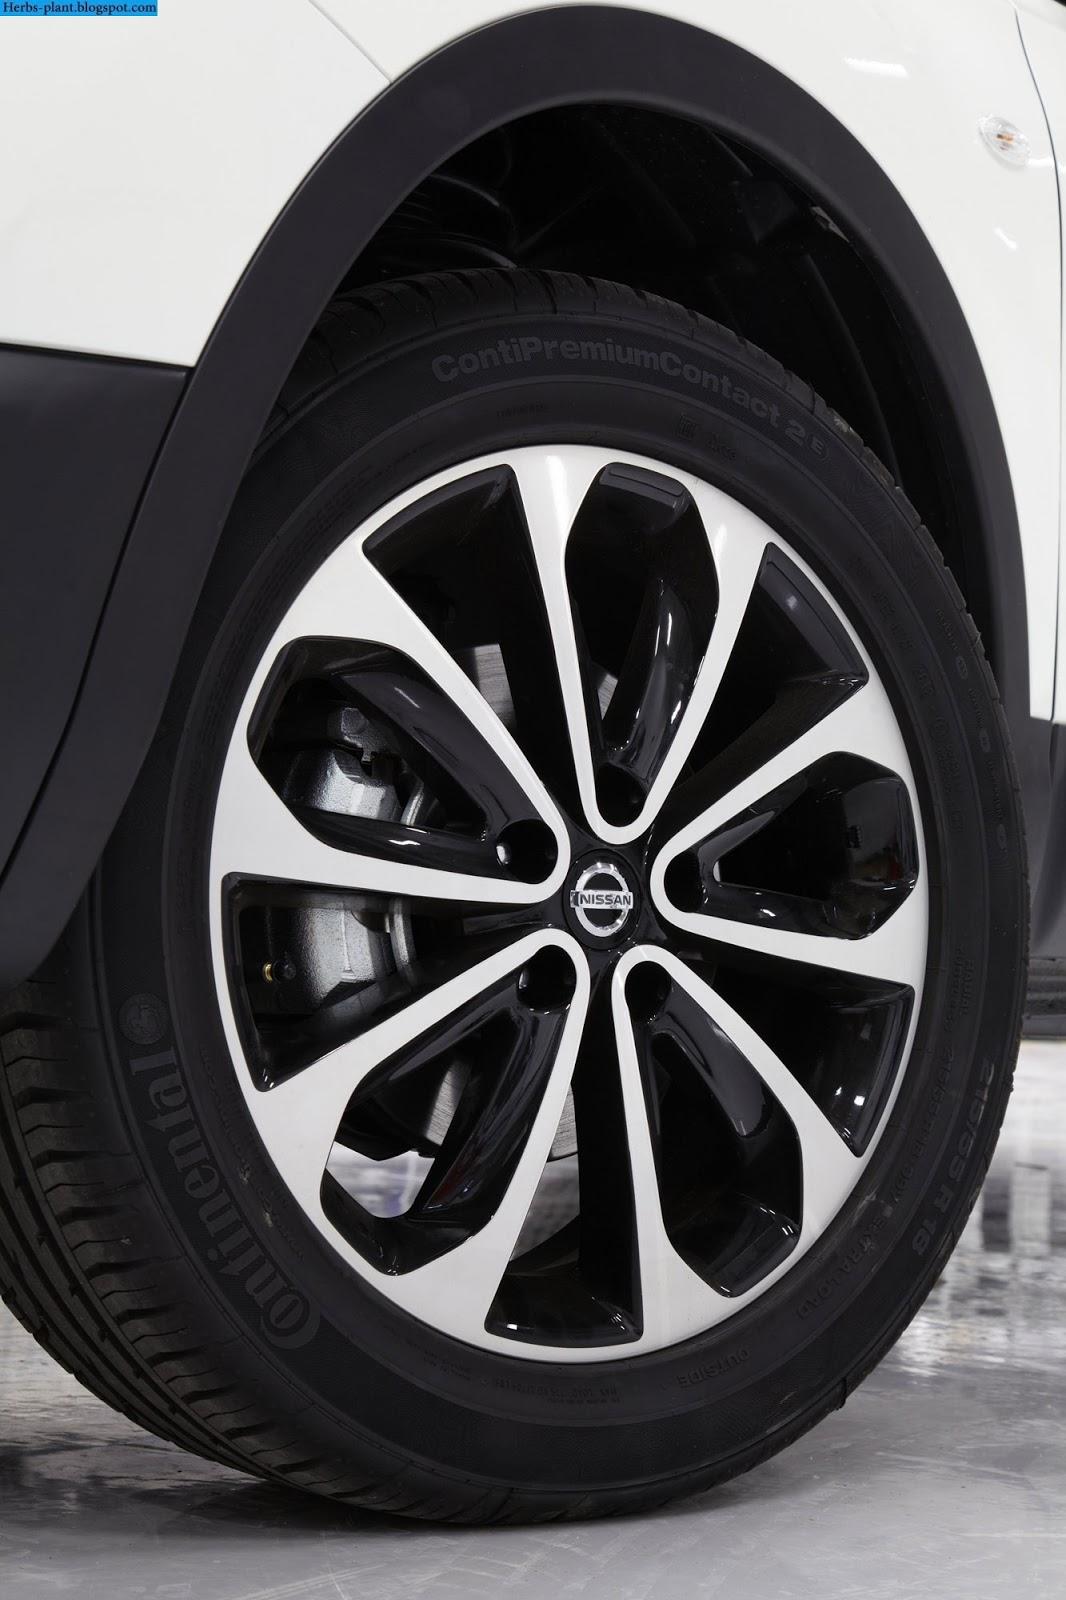 Nissan qashqai car 2013 tyres/wheels - صور اطارات سيارة نيسان كاشكاي 2013